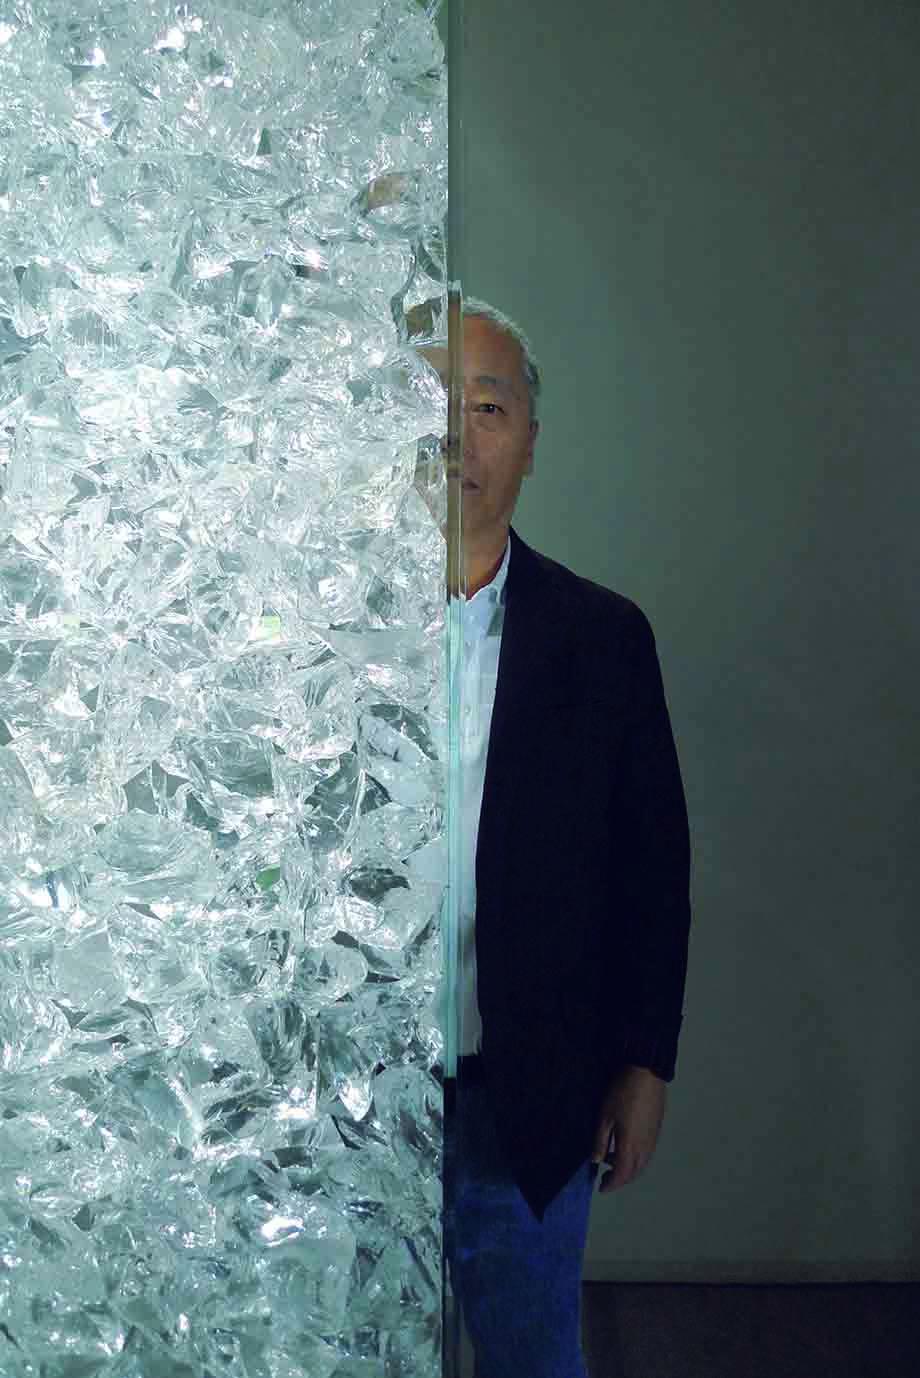 京都市京セラ美術館開館記念展「杉本博司 瑠璃の浄土」 © Sugimoto Studio